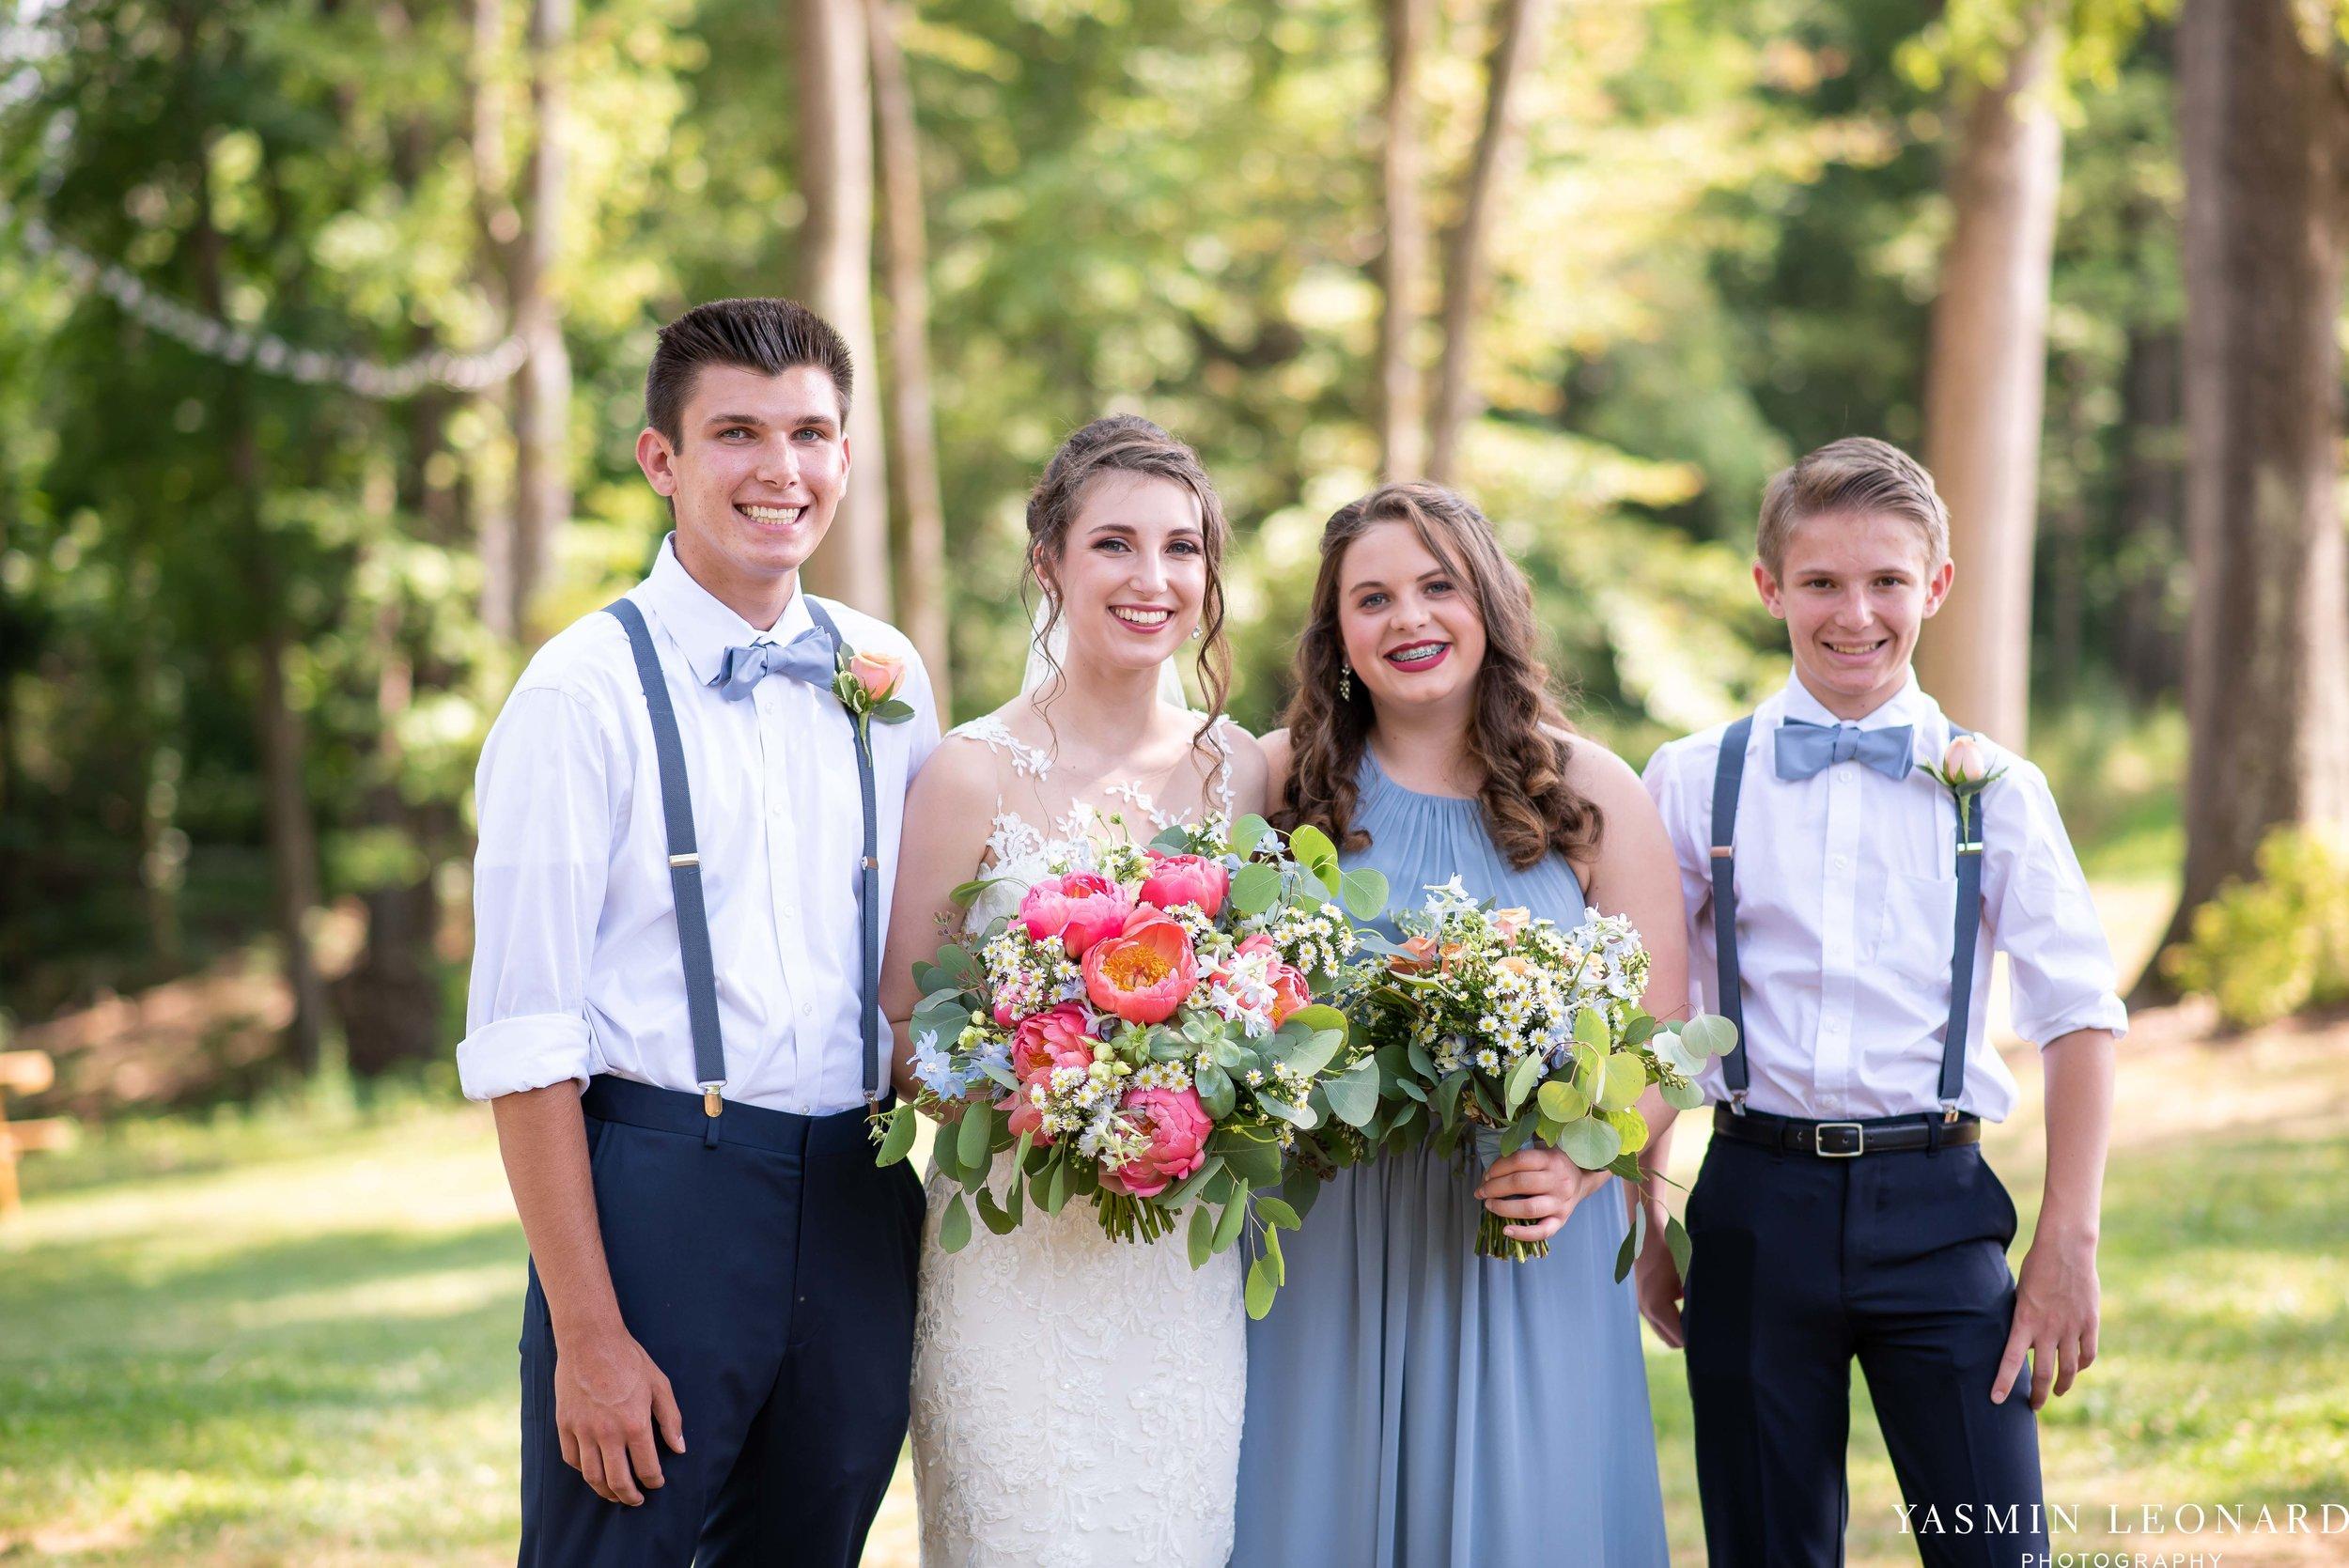 Old Homeplace Vineyard - NC Weddings - Outdoor Summer Weddings - Peony Boutique - Vineyard Wedding - NC Photographer - Yasmin Leonard Photography-23.jpg